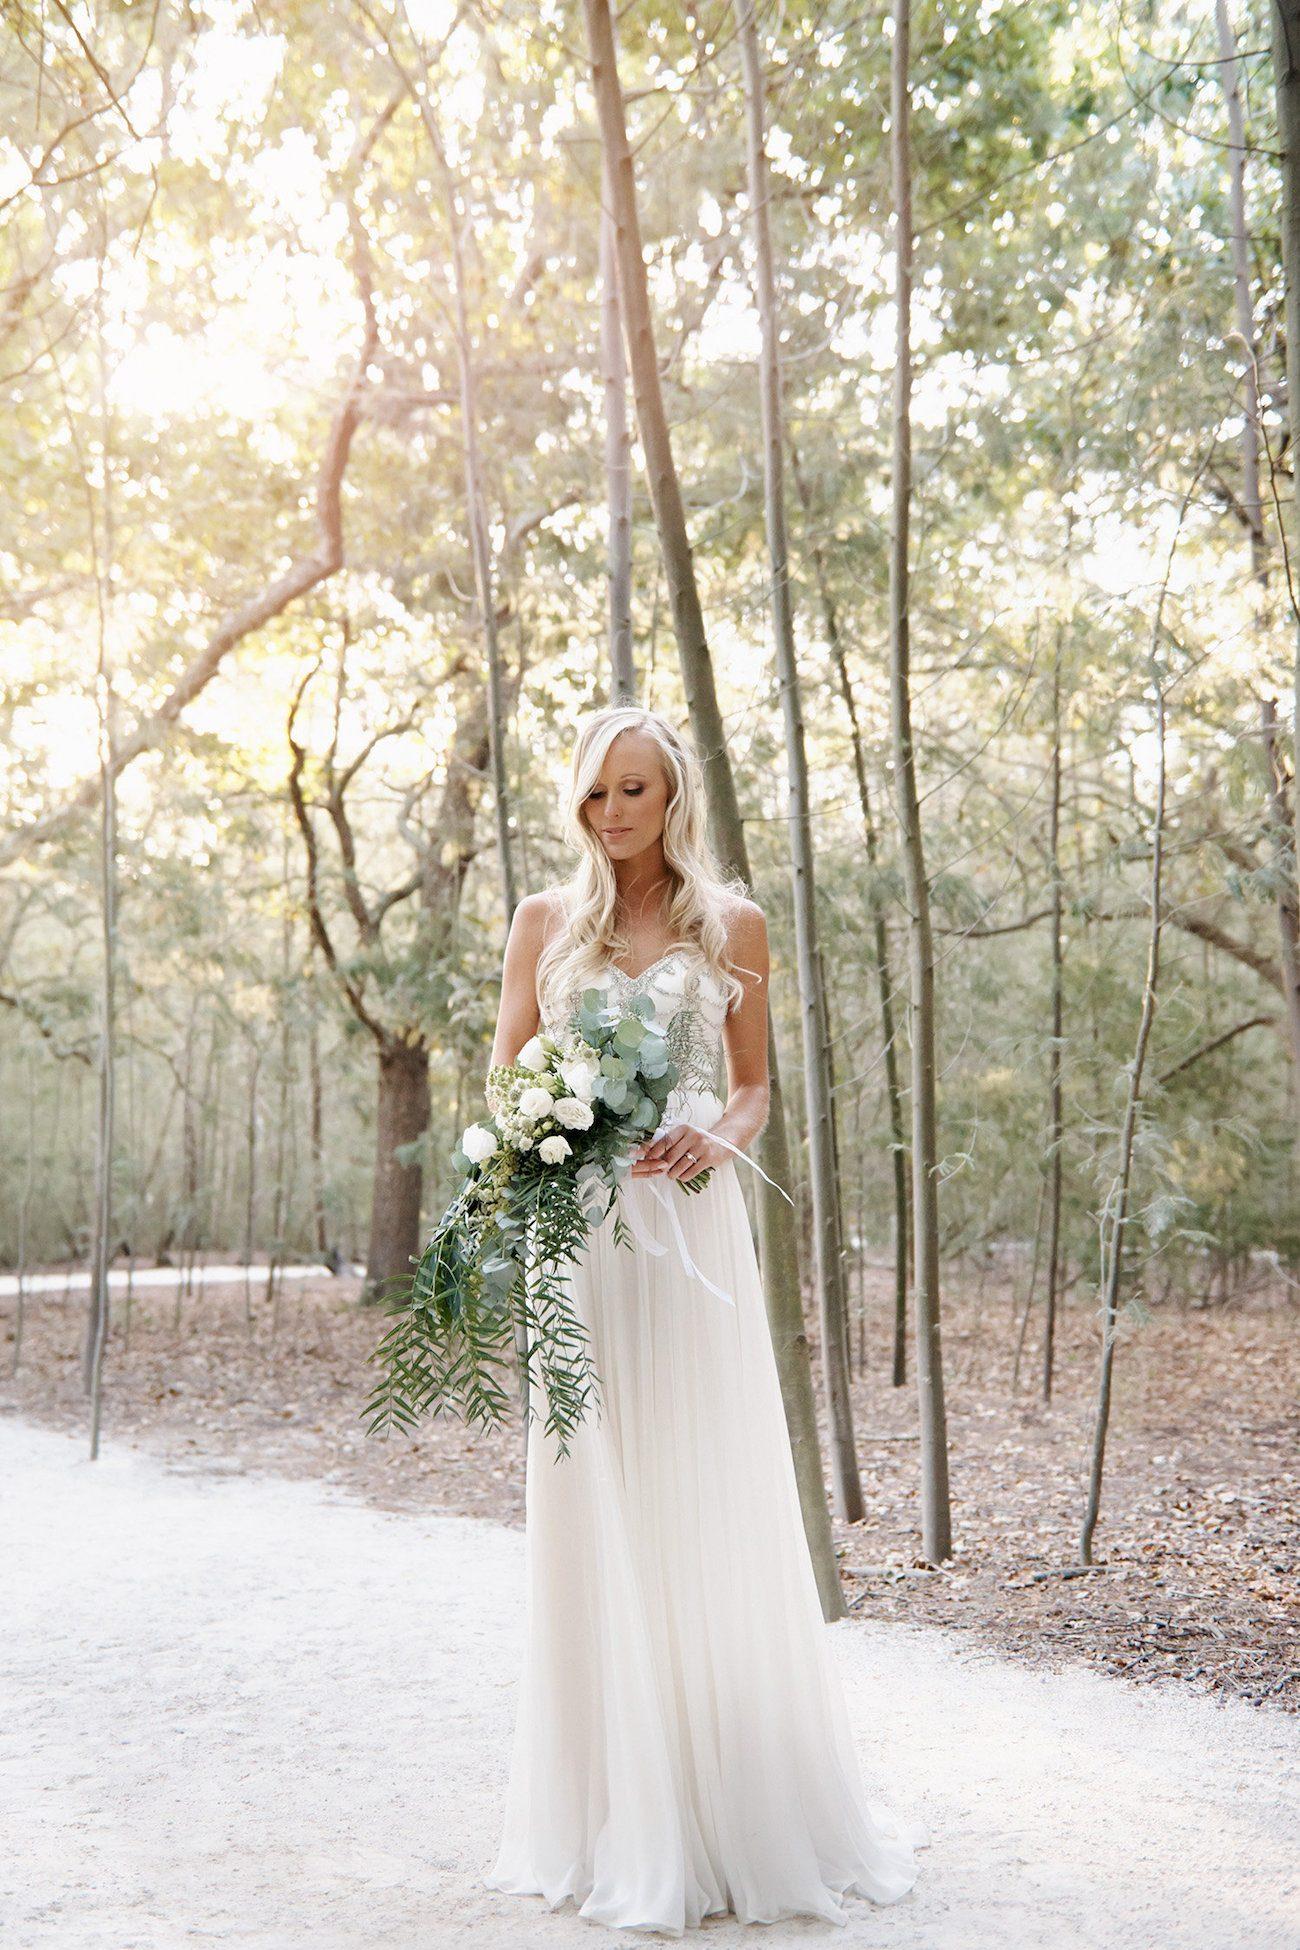 Beautiful Catherine Deane Wedding Dress   Image: Knit Together Photography